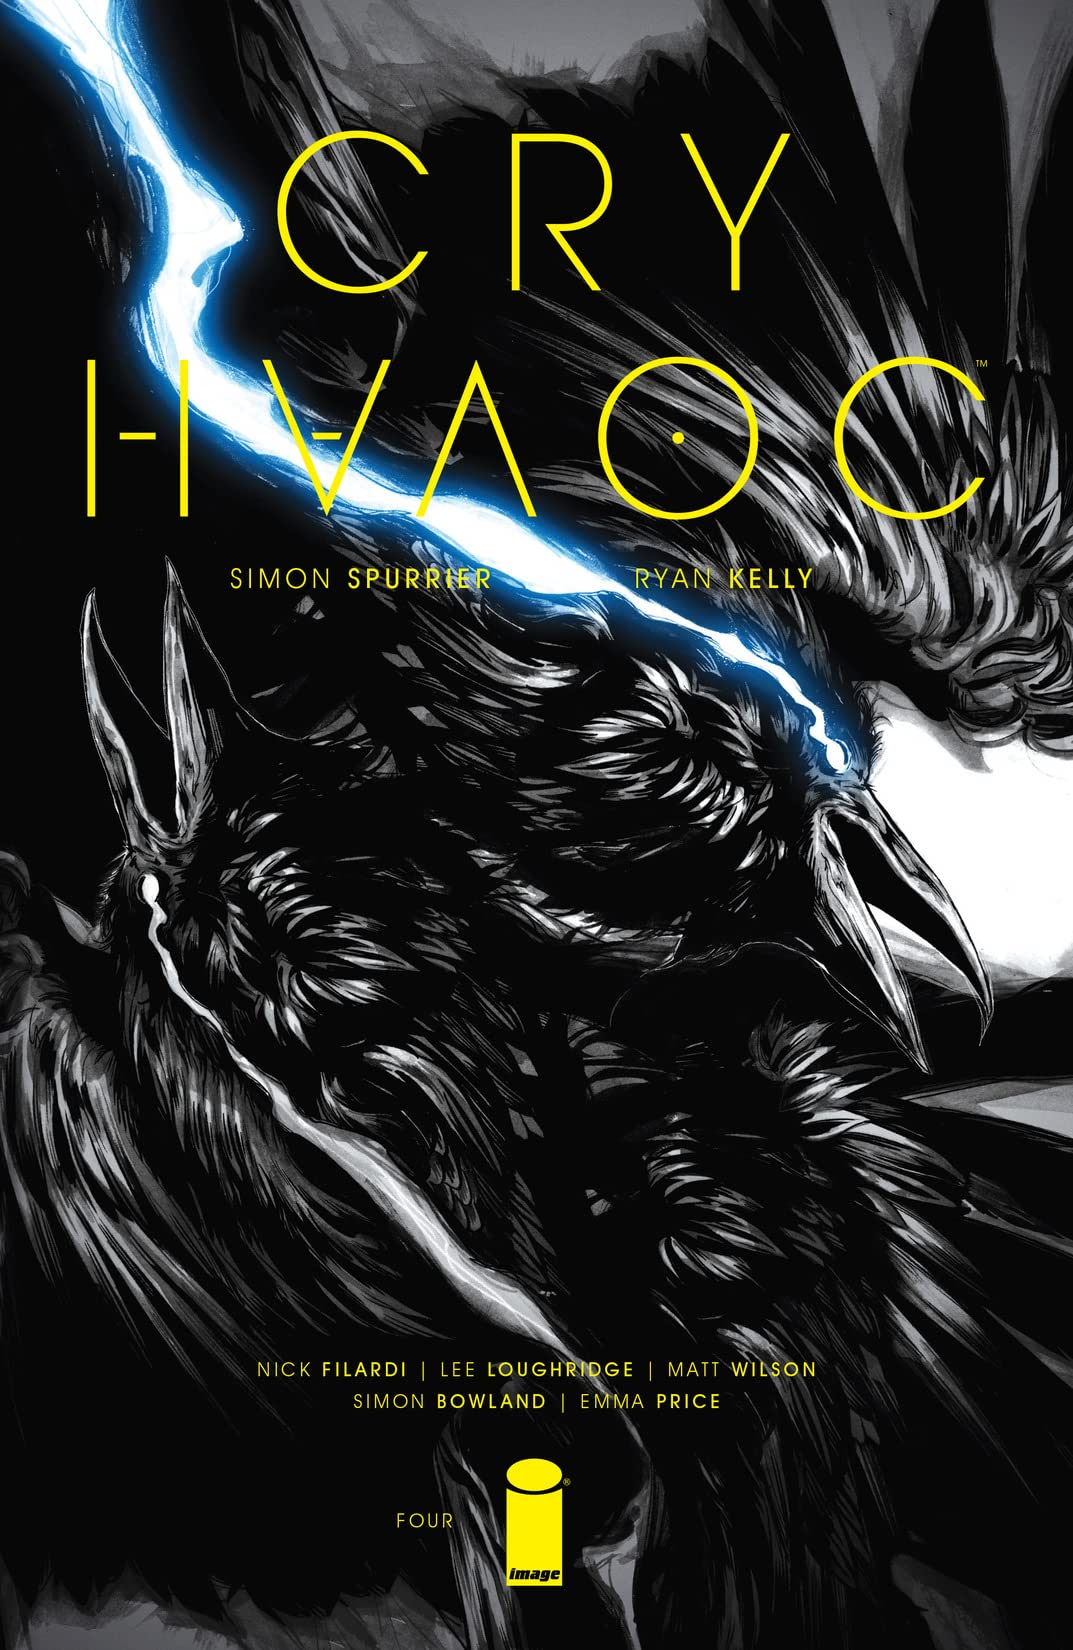 Cry Havoc #4